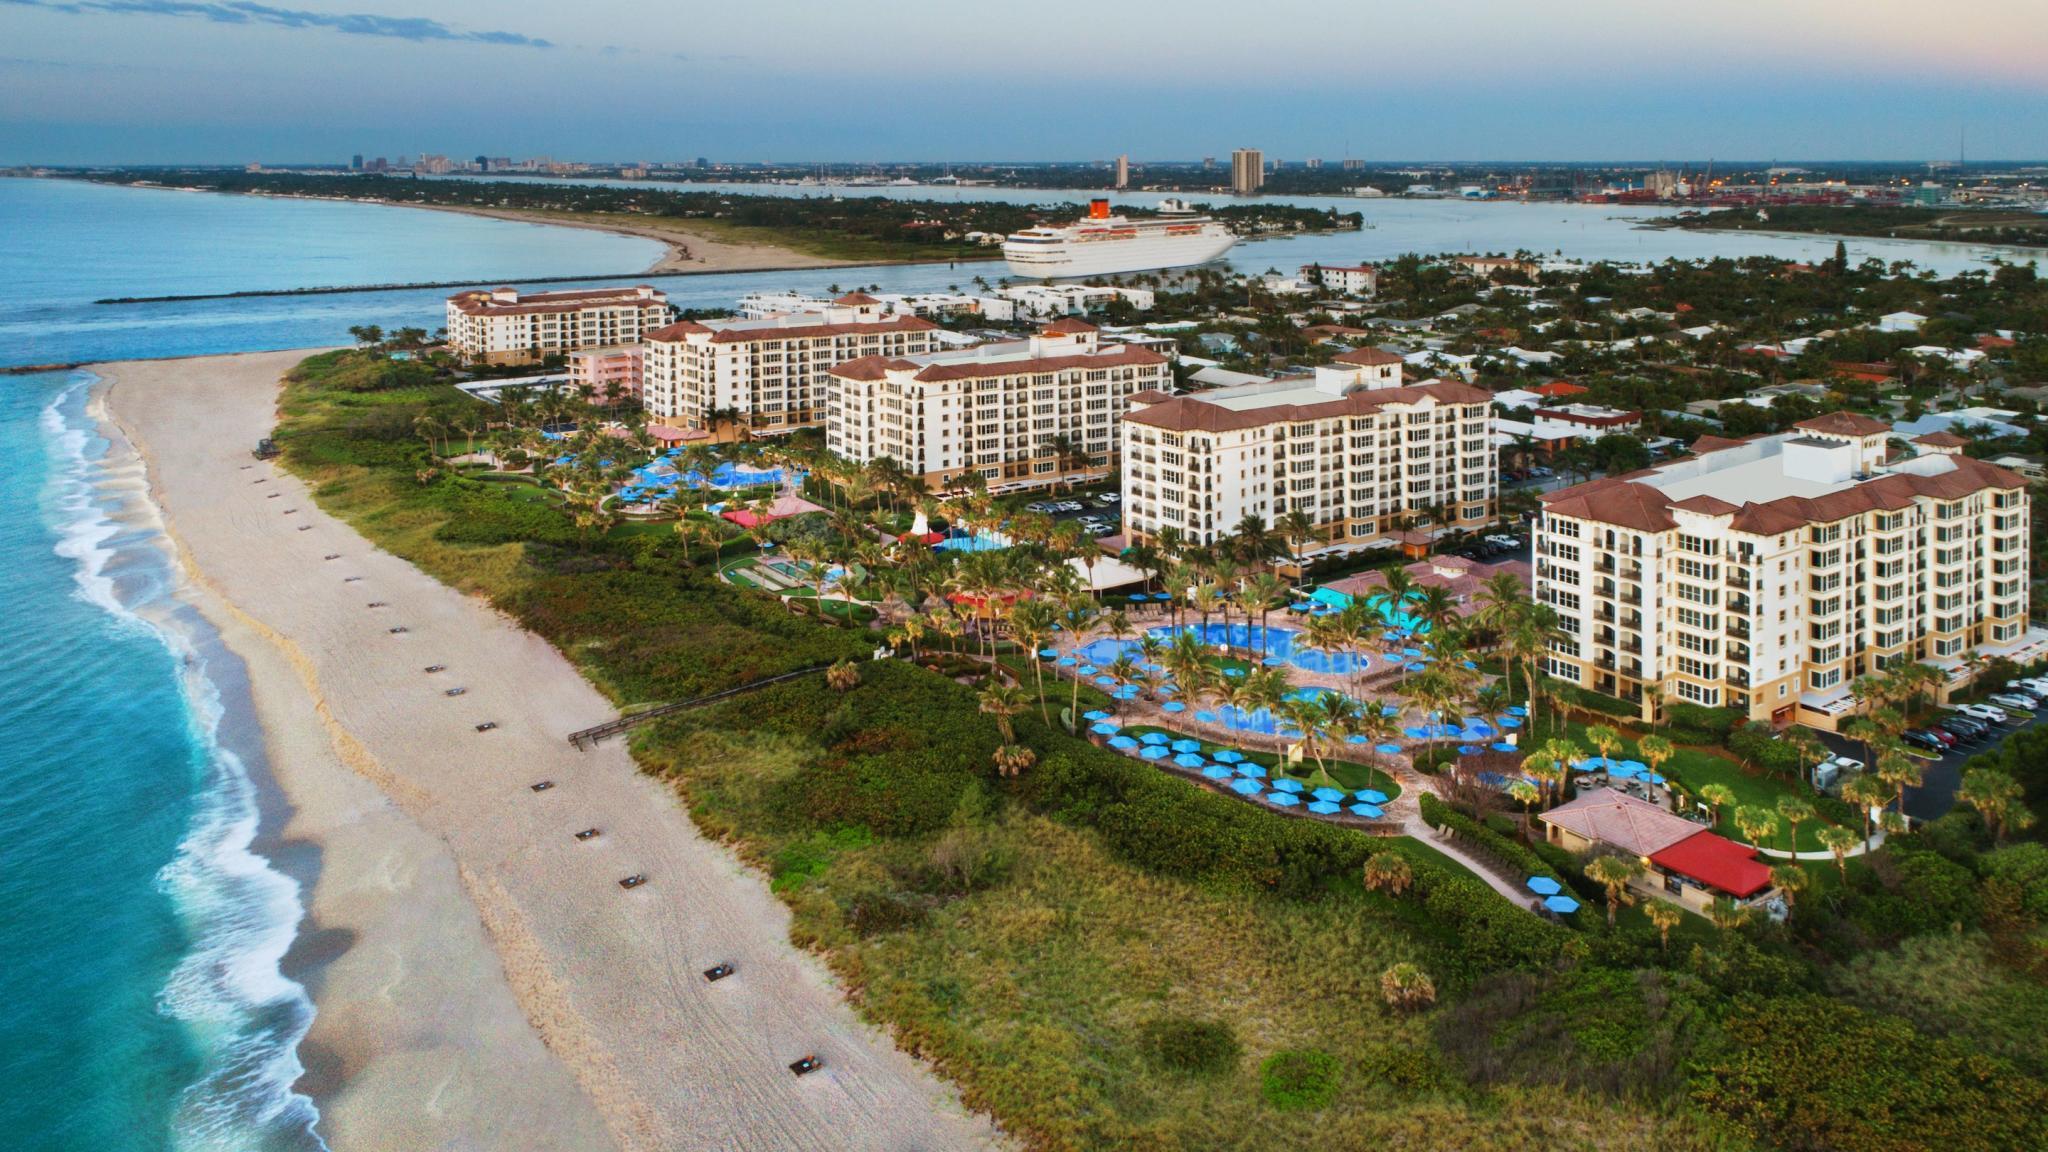 8. Marriott Ocean Pointe